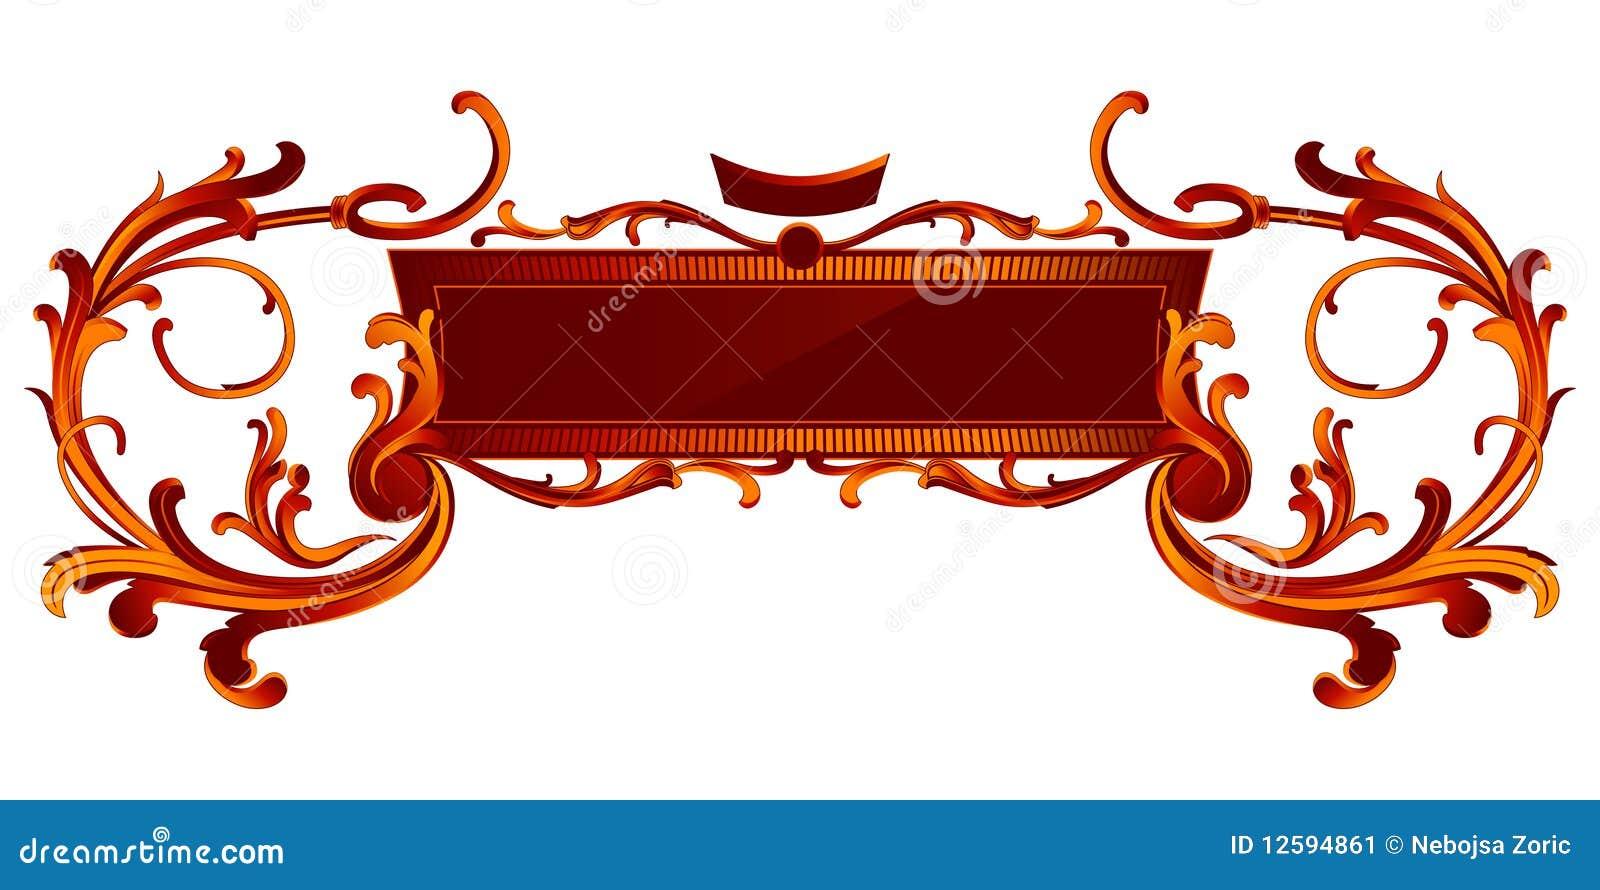 Retro royal banner stock vector. Illustration of plant ...